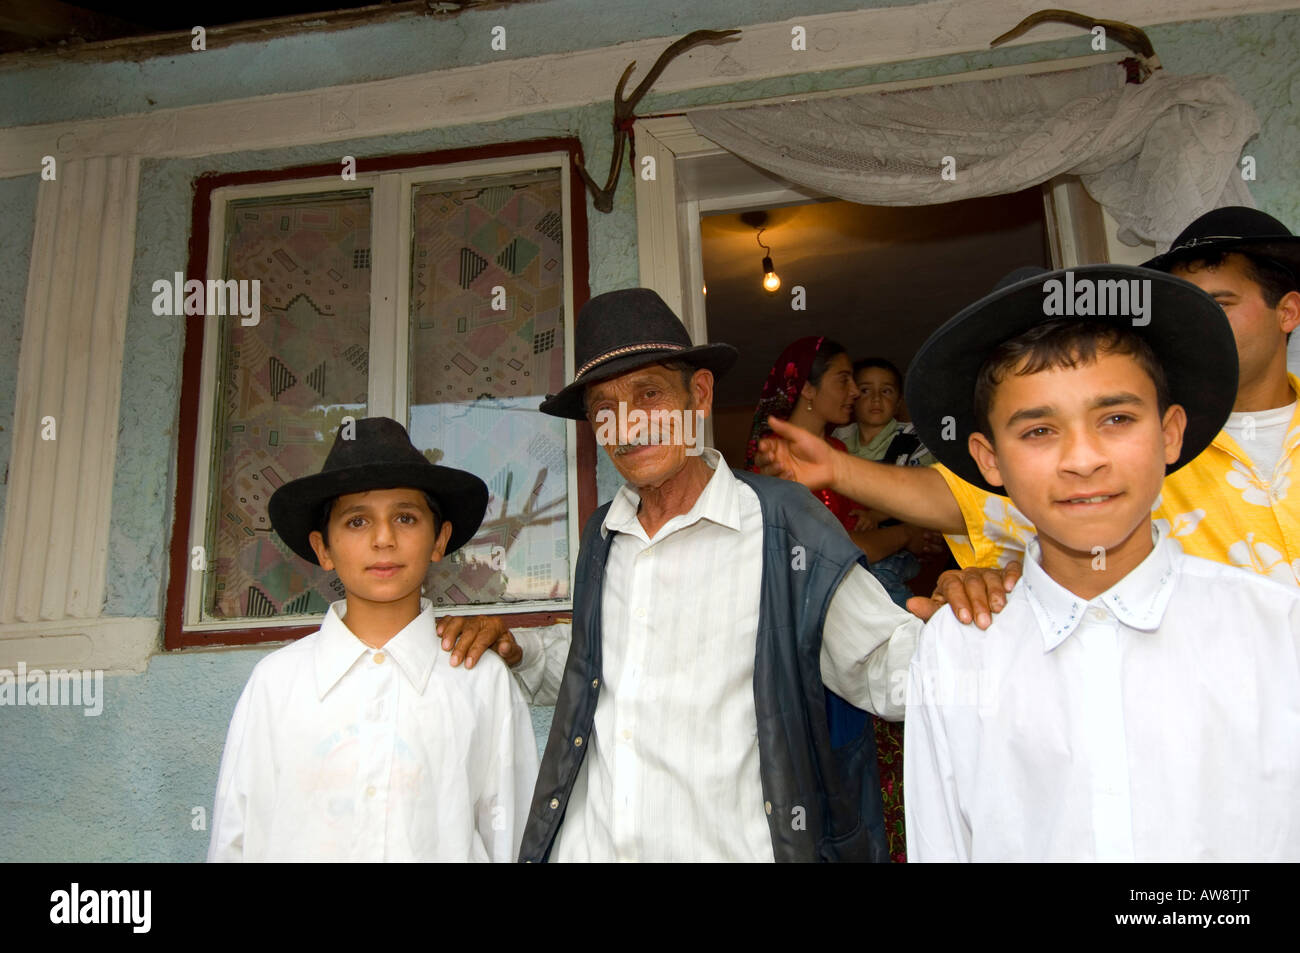 Gypsy Men Stock Photos & Gypsy Men Stock Images - Alamy